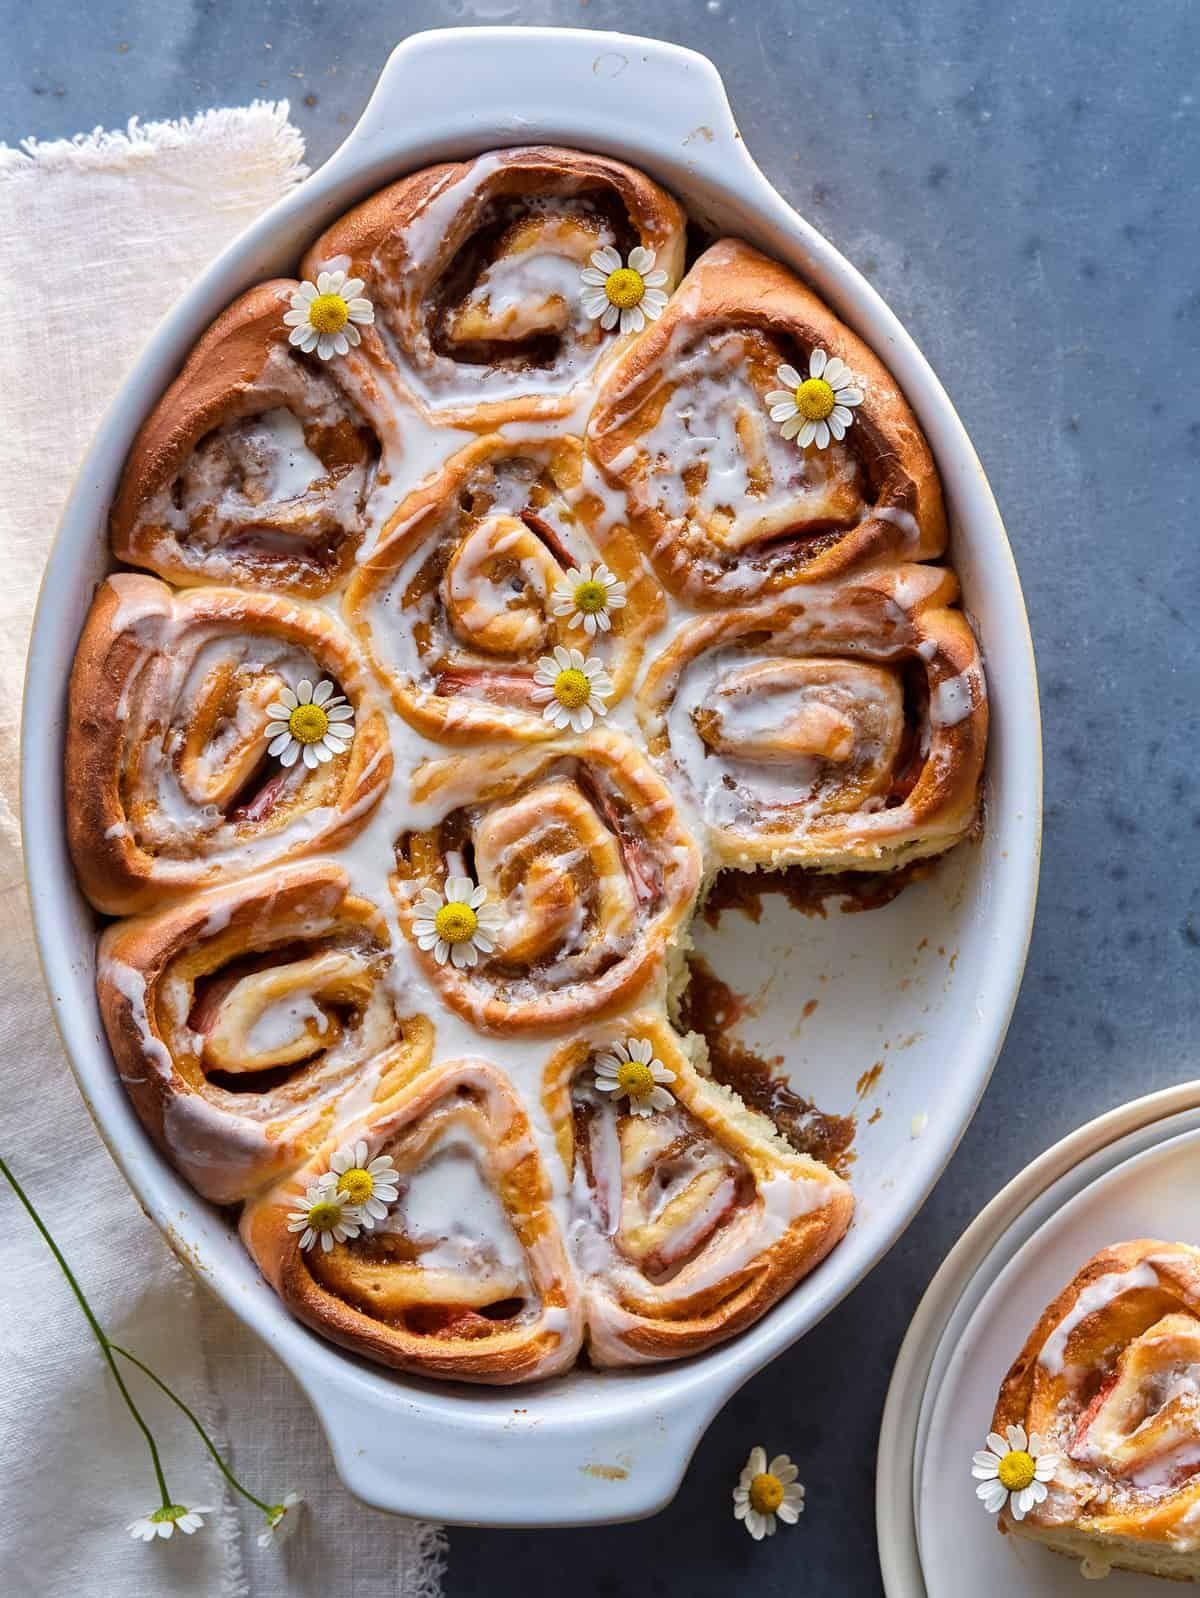 Strawberry Studded Cinnamon Rolls with Chamomile-Vanilla Glaze